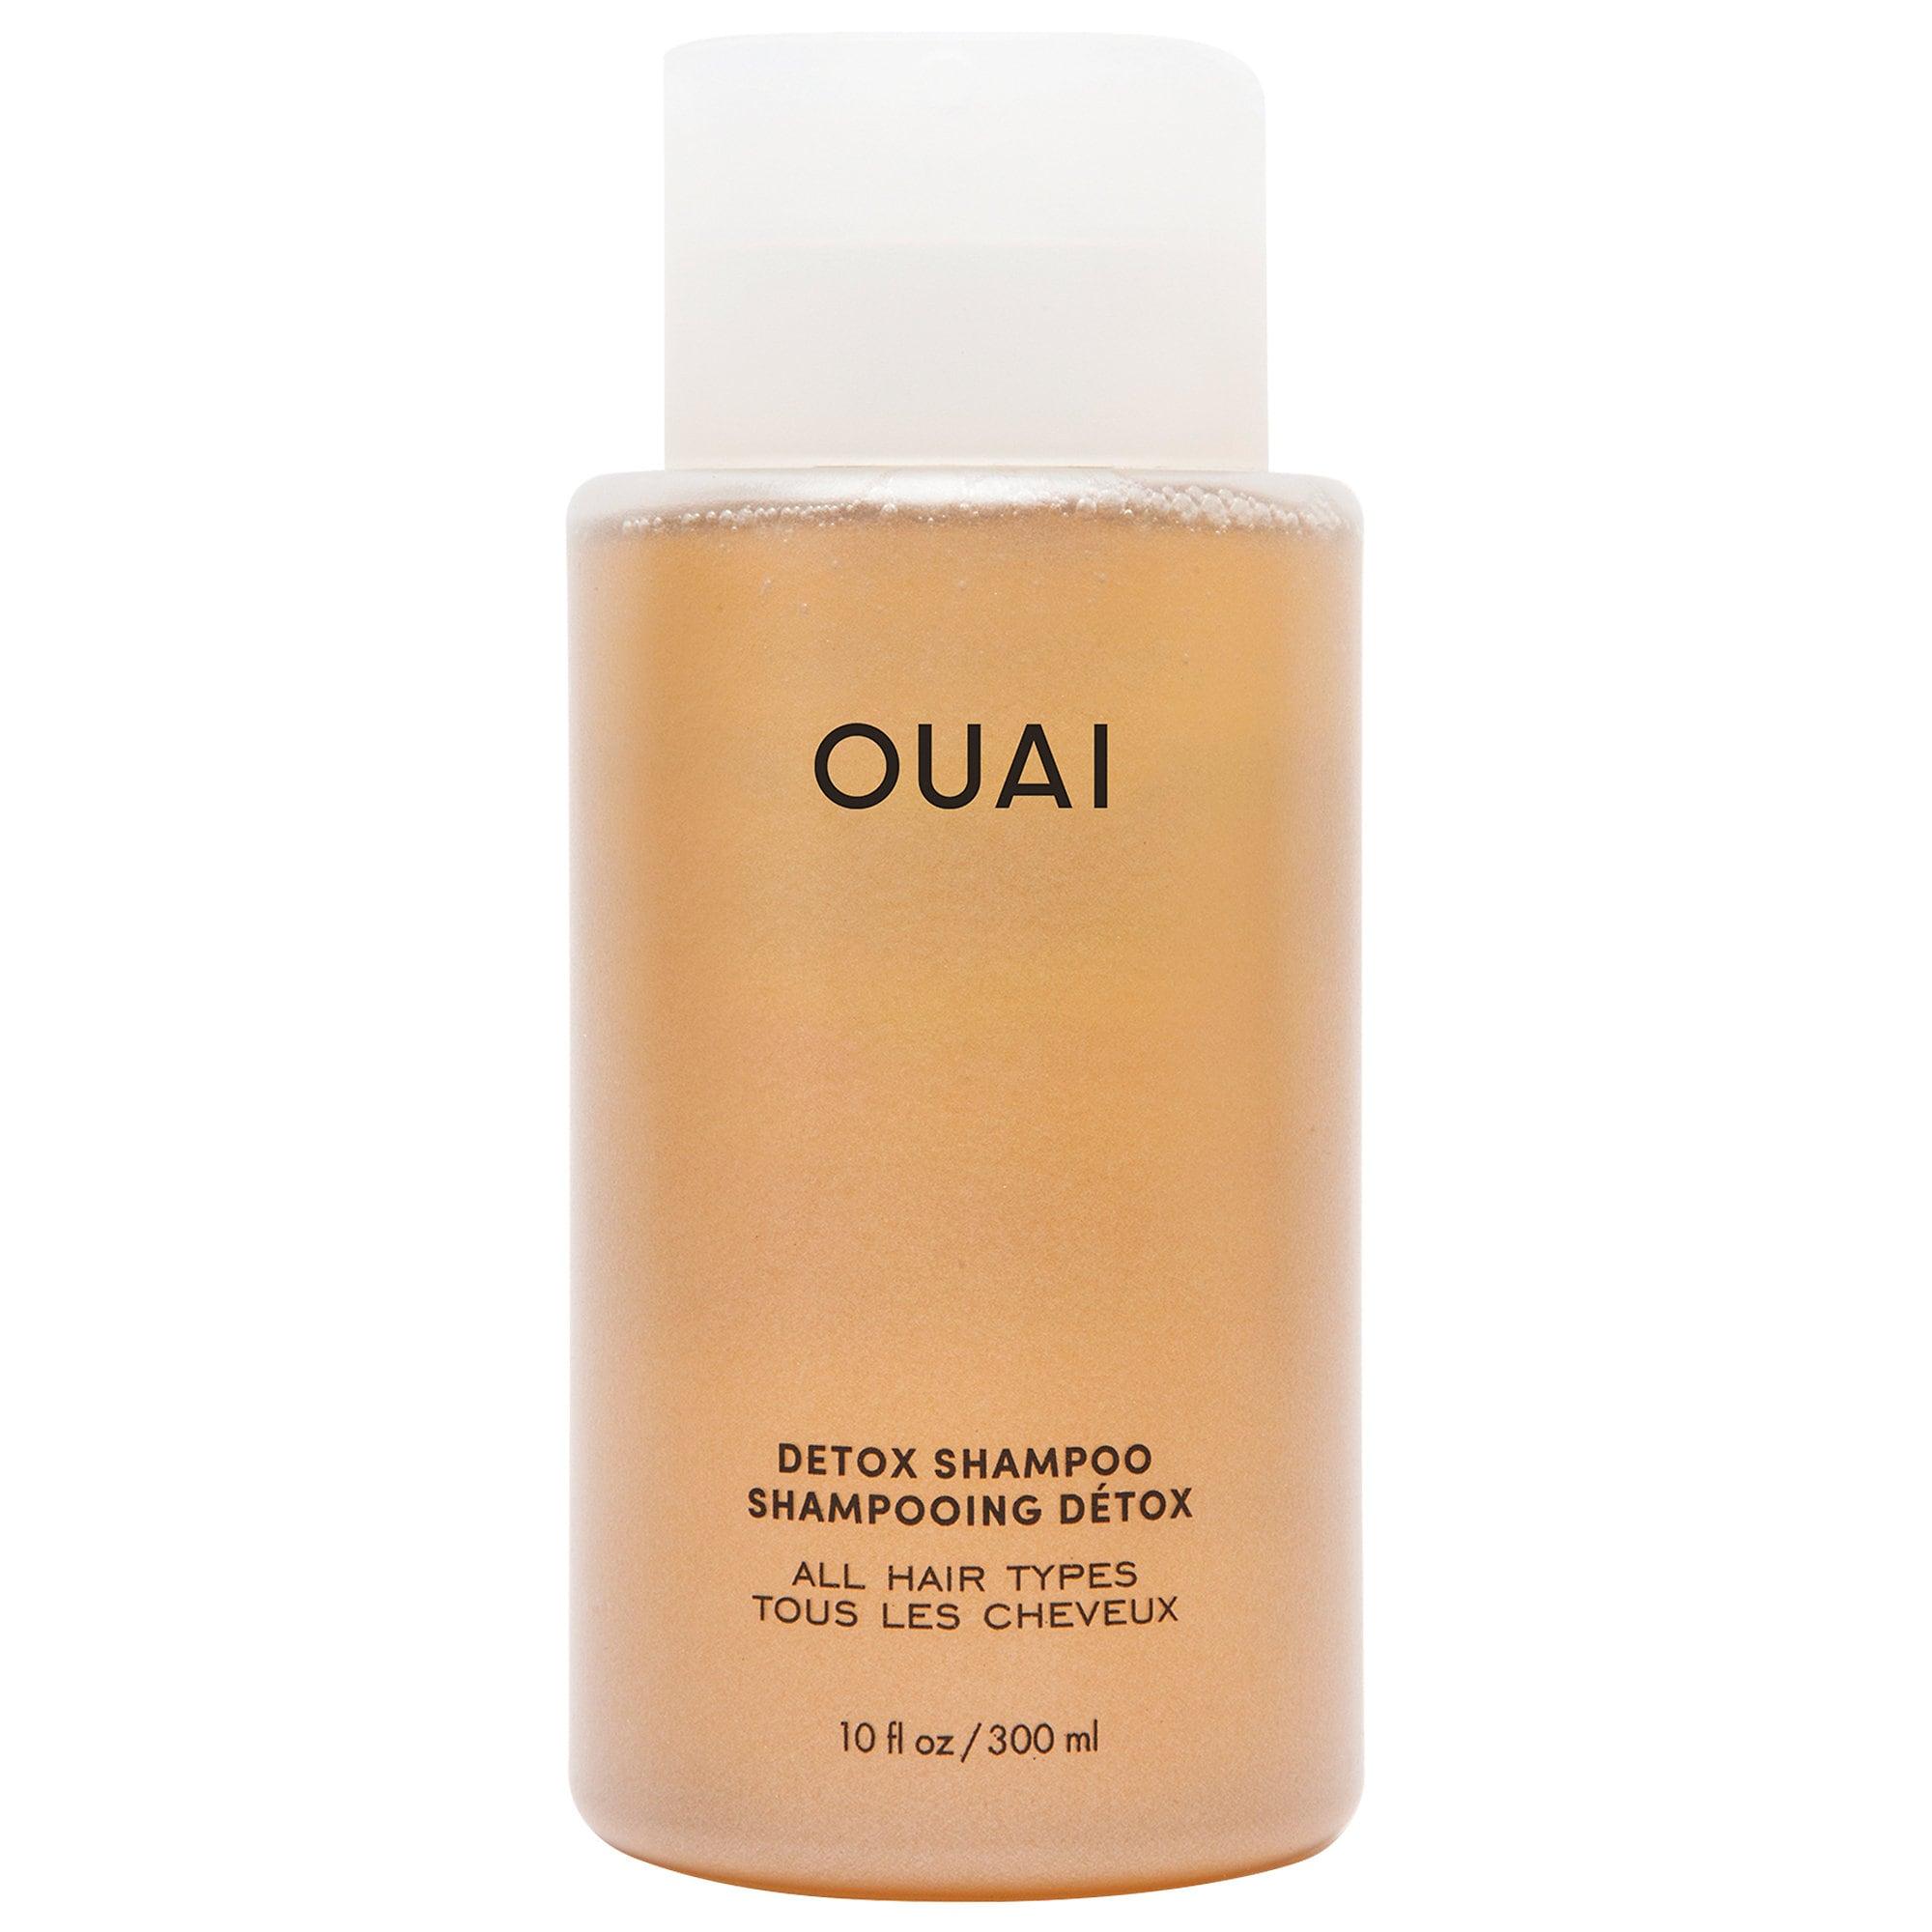 Ouai - Detox Shampoo